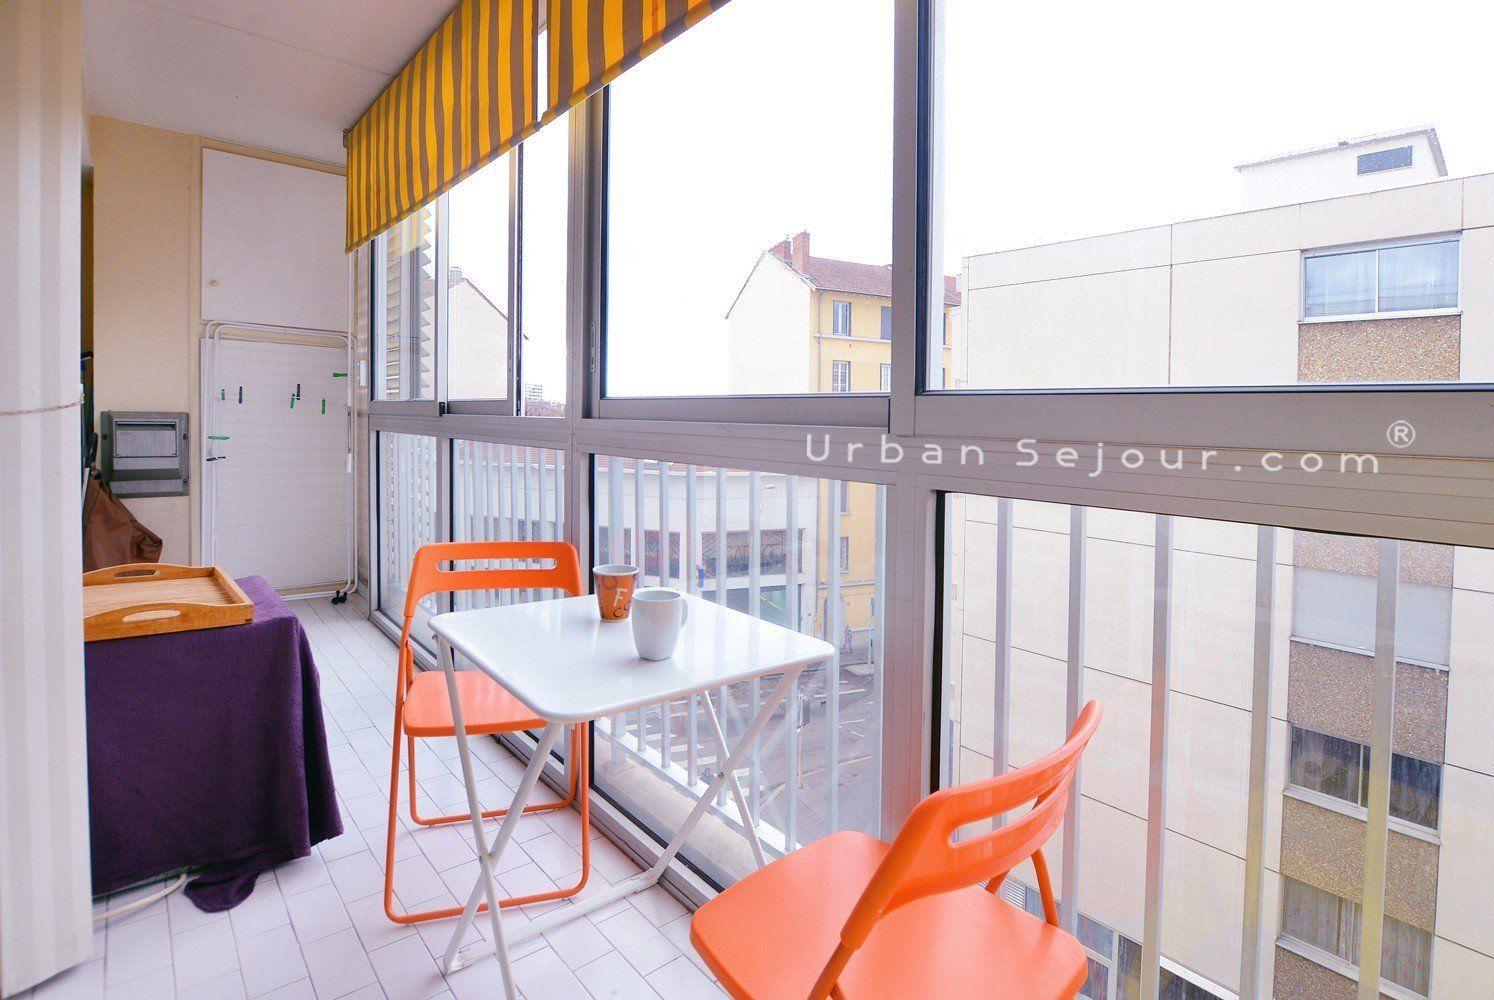 Location Appartement meubl 3 chambres  Location saisonnire Lyon 7  Garibaldi Universit